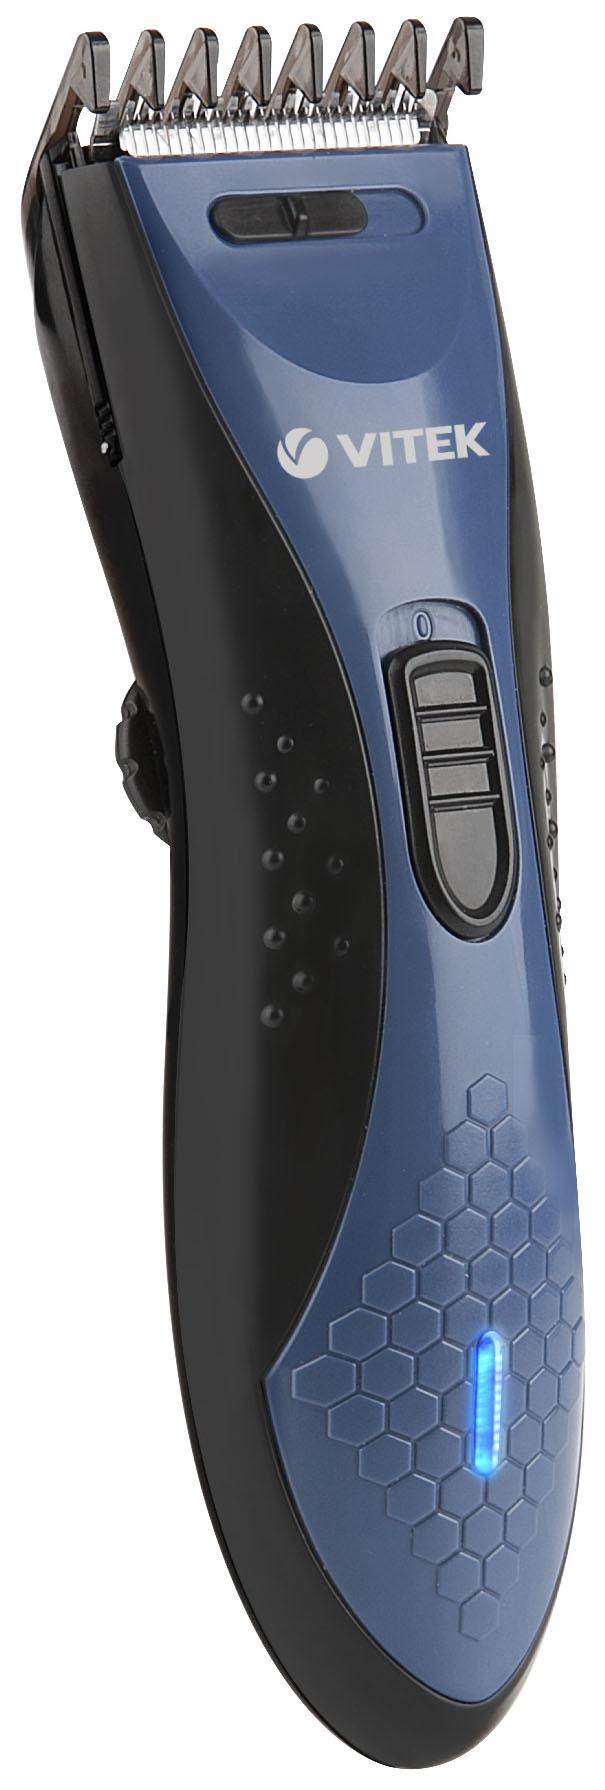 Машинка для стрижки волос Vitek VT 2578